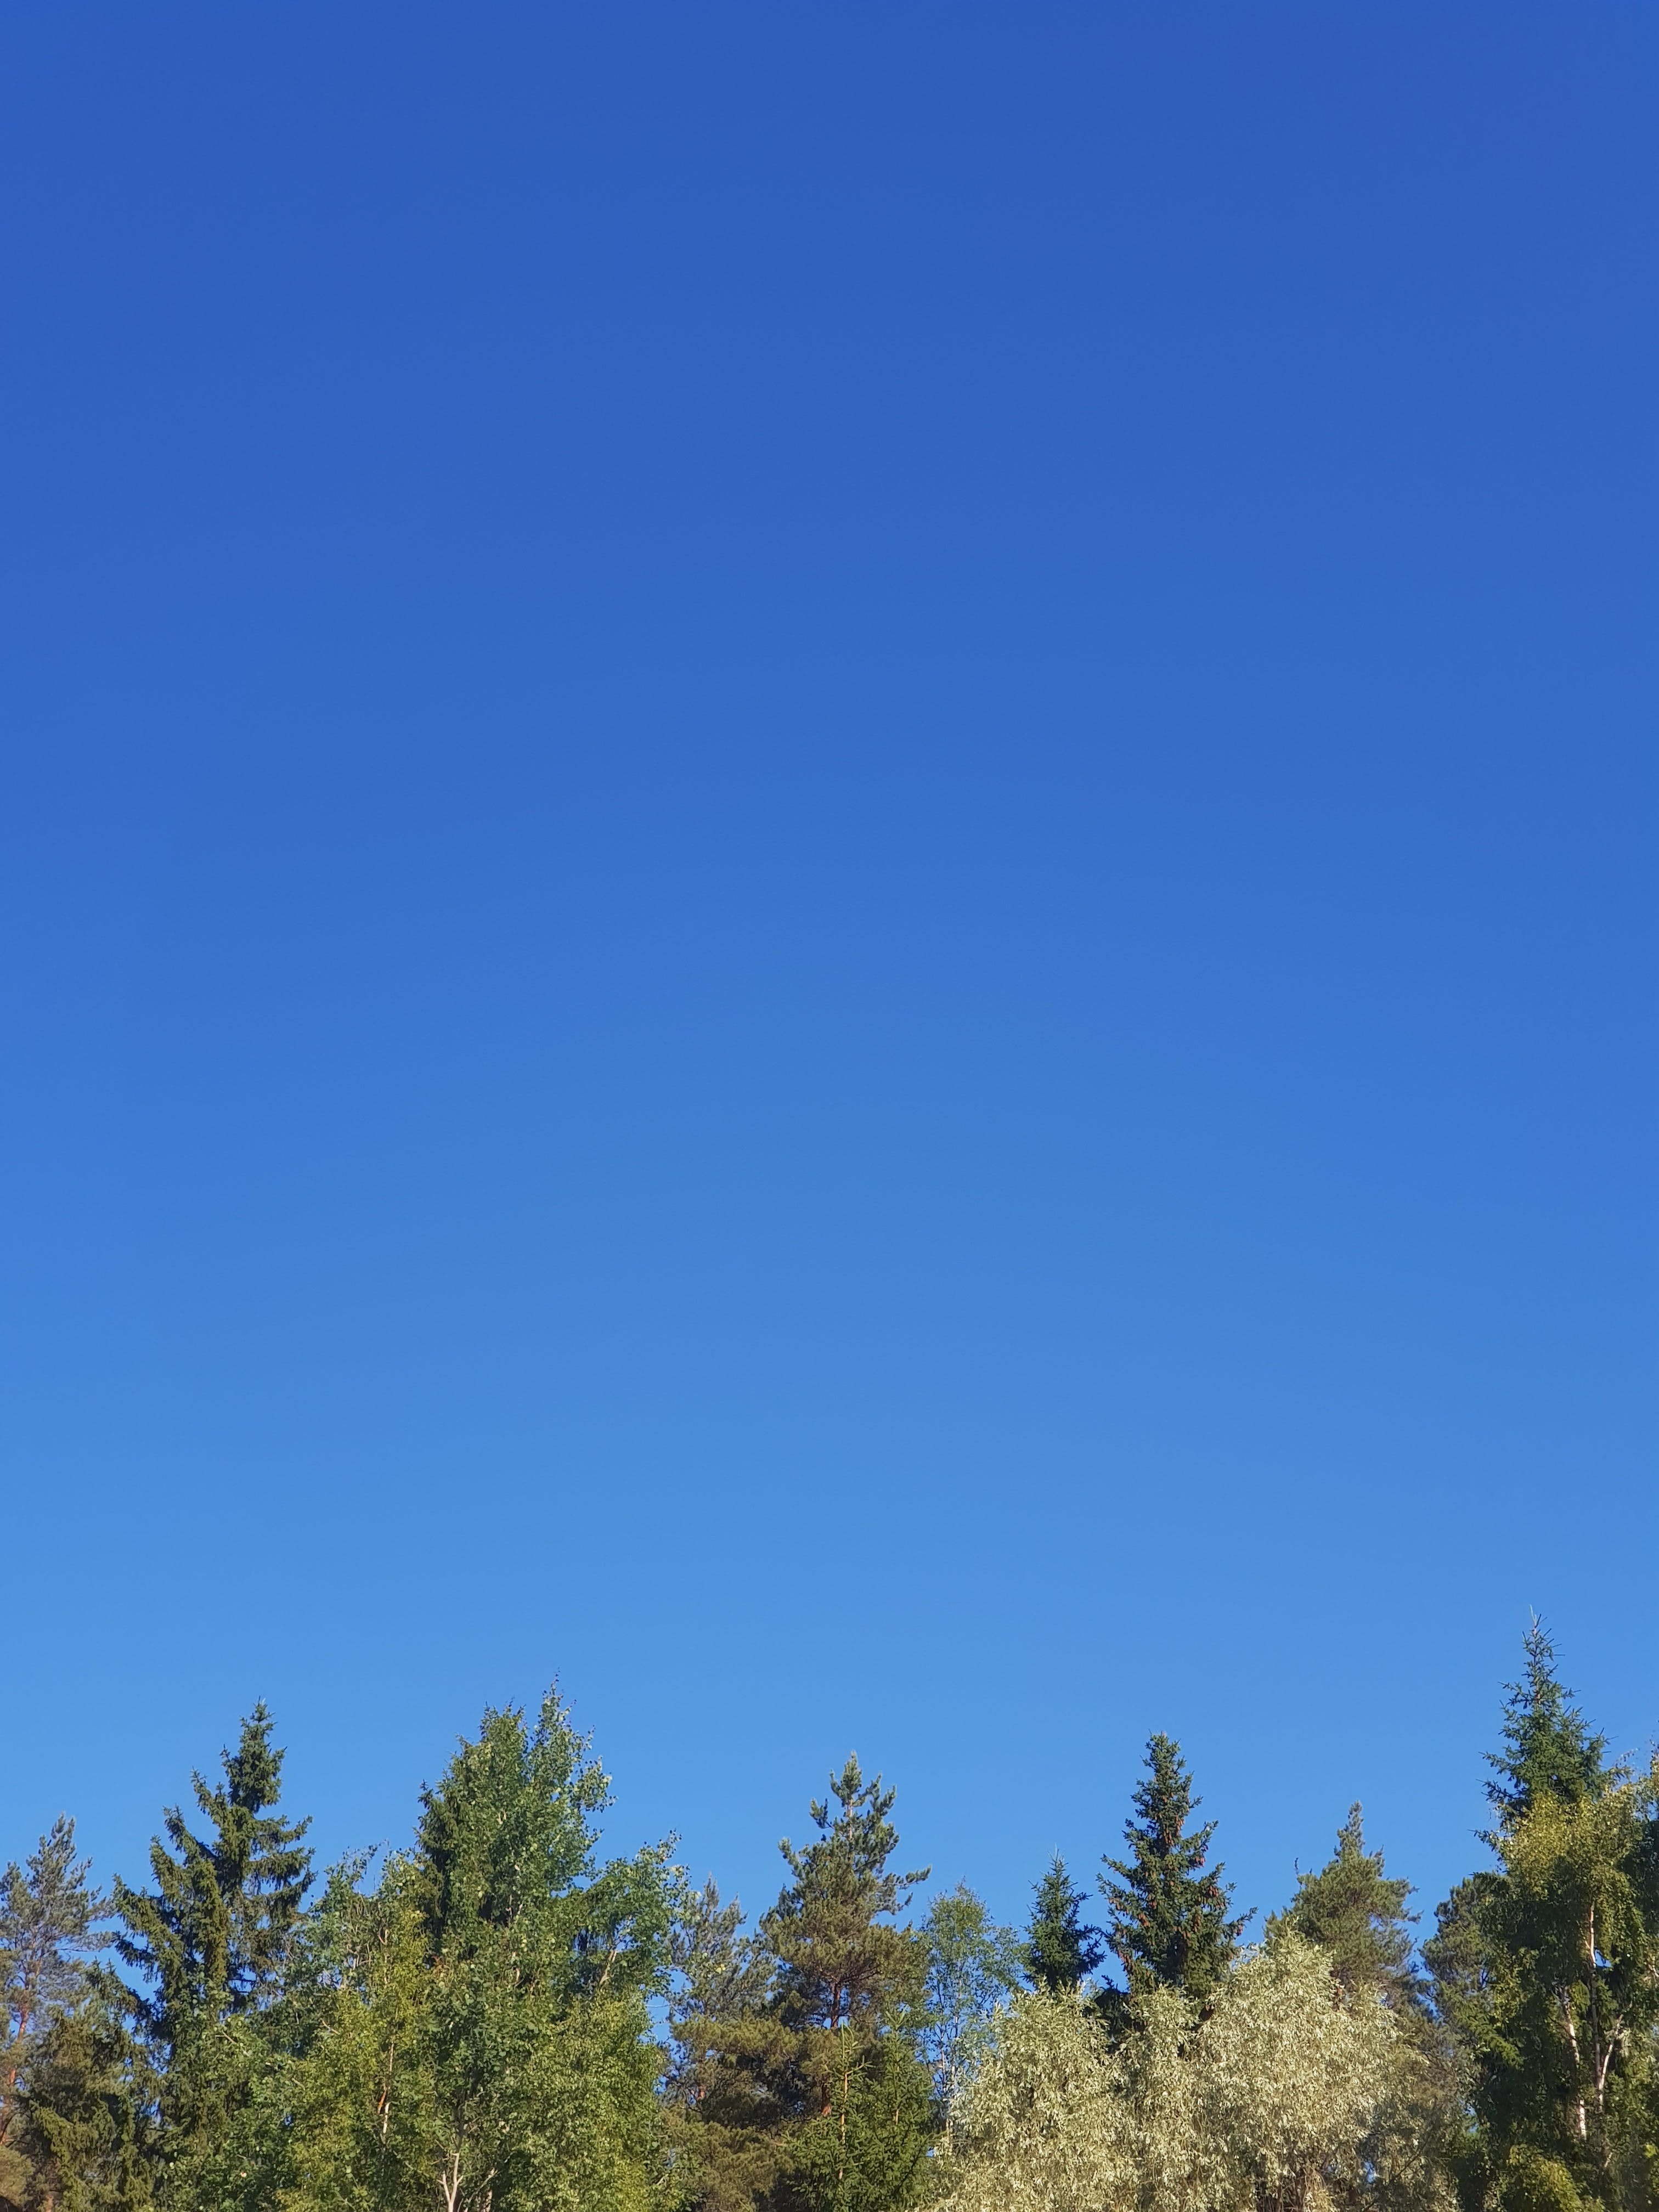 Free stock photo of blue sky, tree